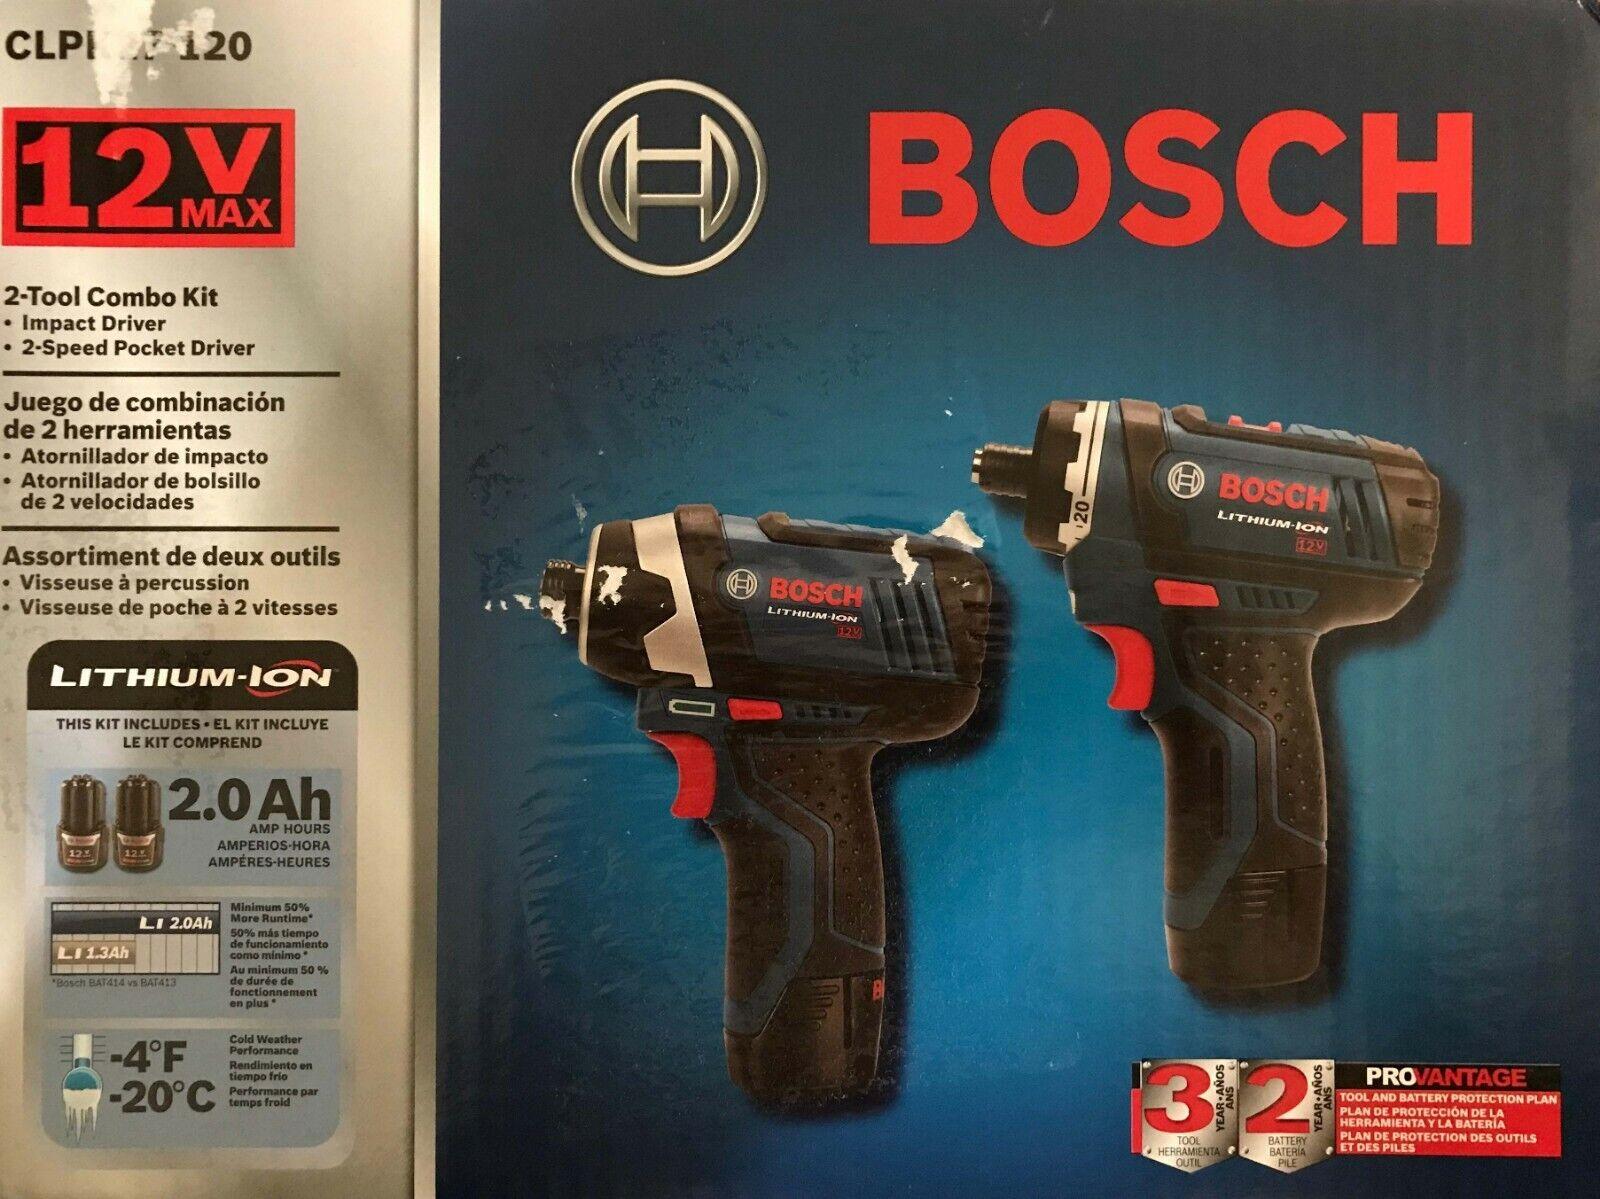 Bosch CLPK27-120 12V Max Cordless Lithium-Ion Drill Driver a